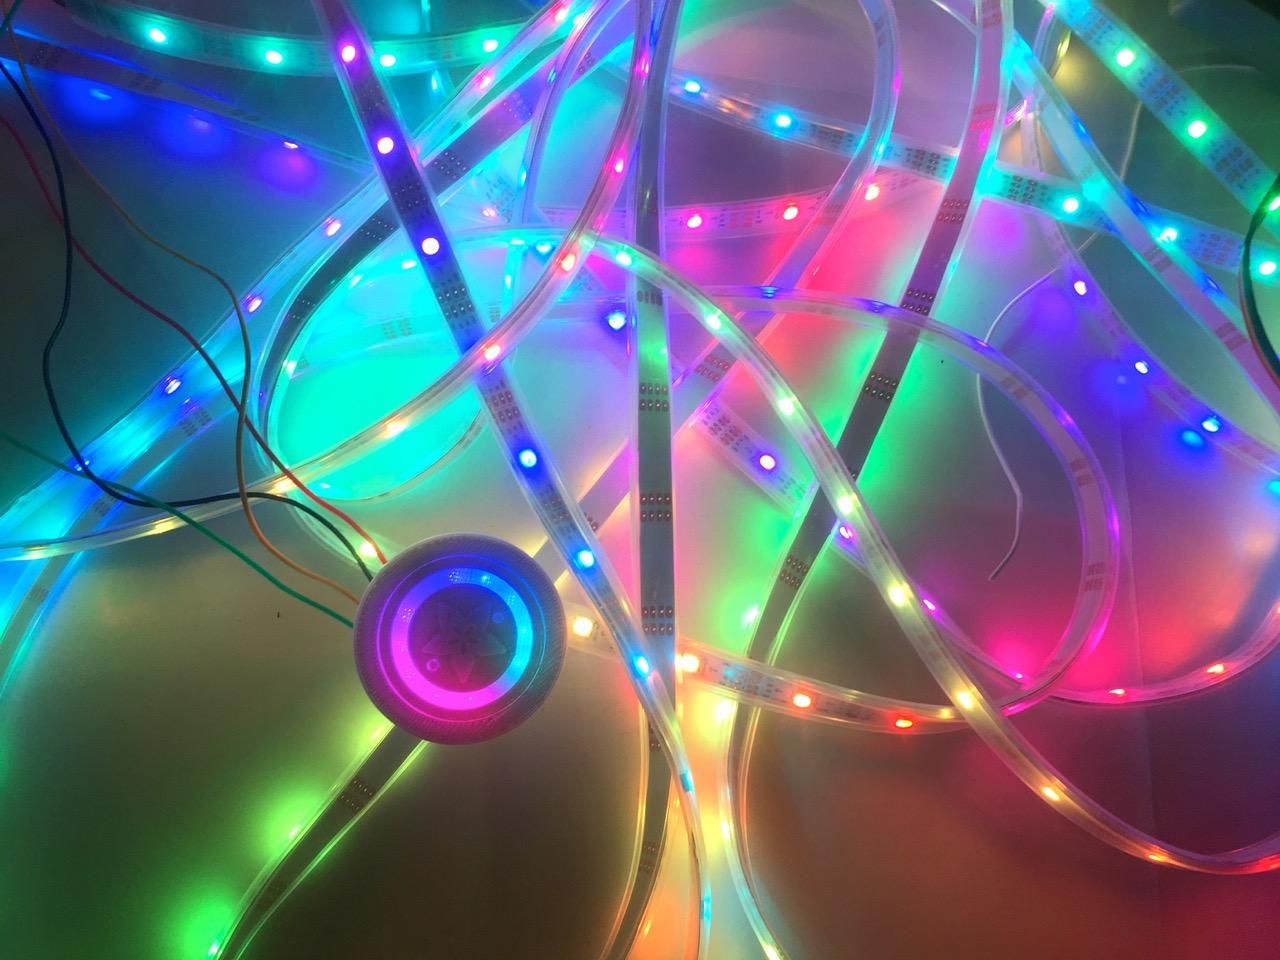 led_strips_14_glowing.jpg